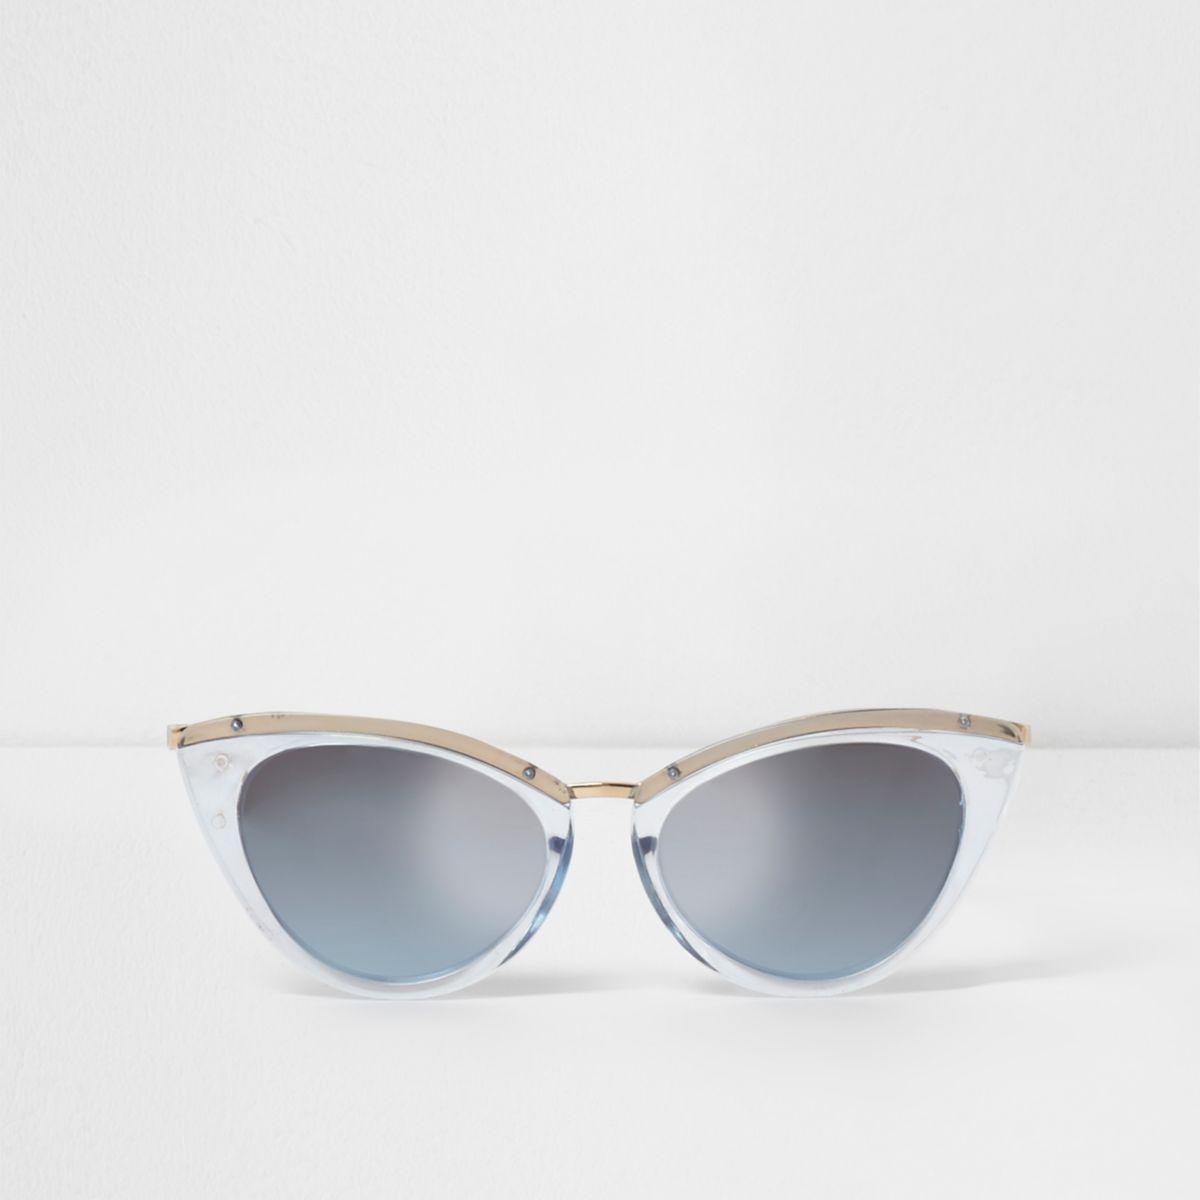 Blue tinted plastic frames cat eye sunglasses